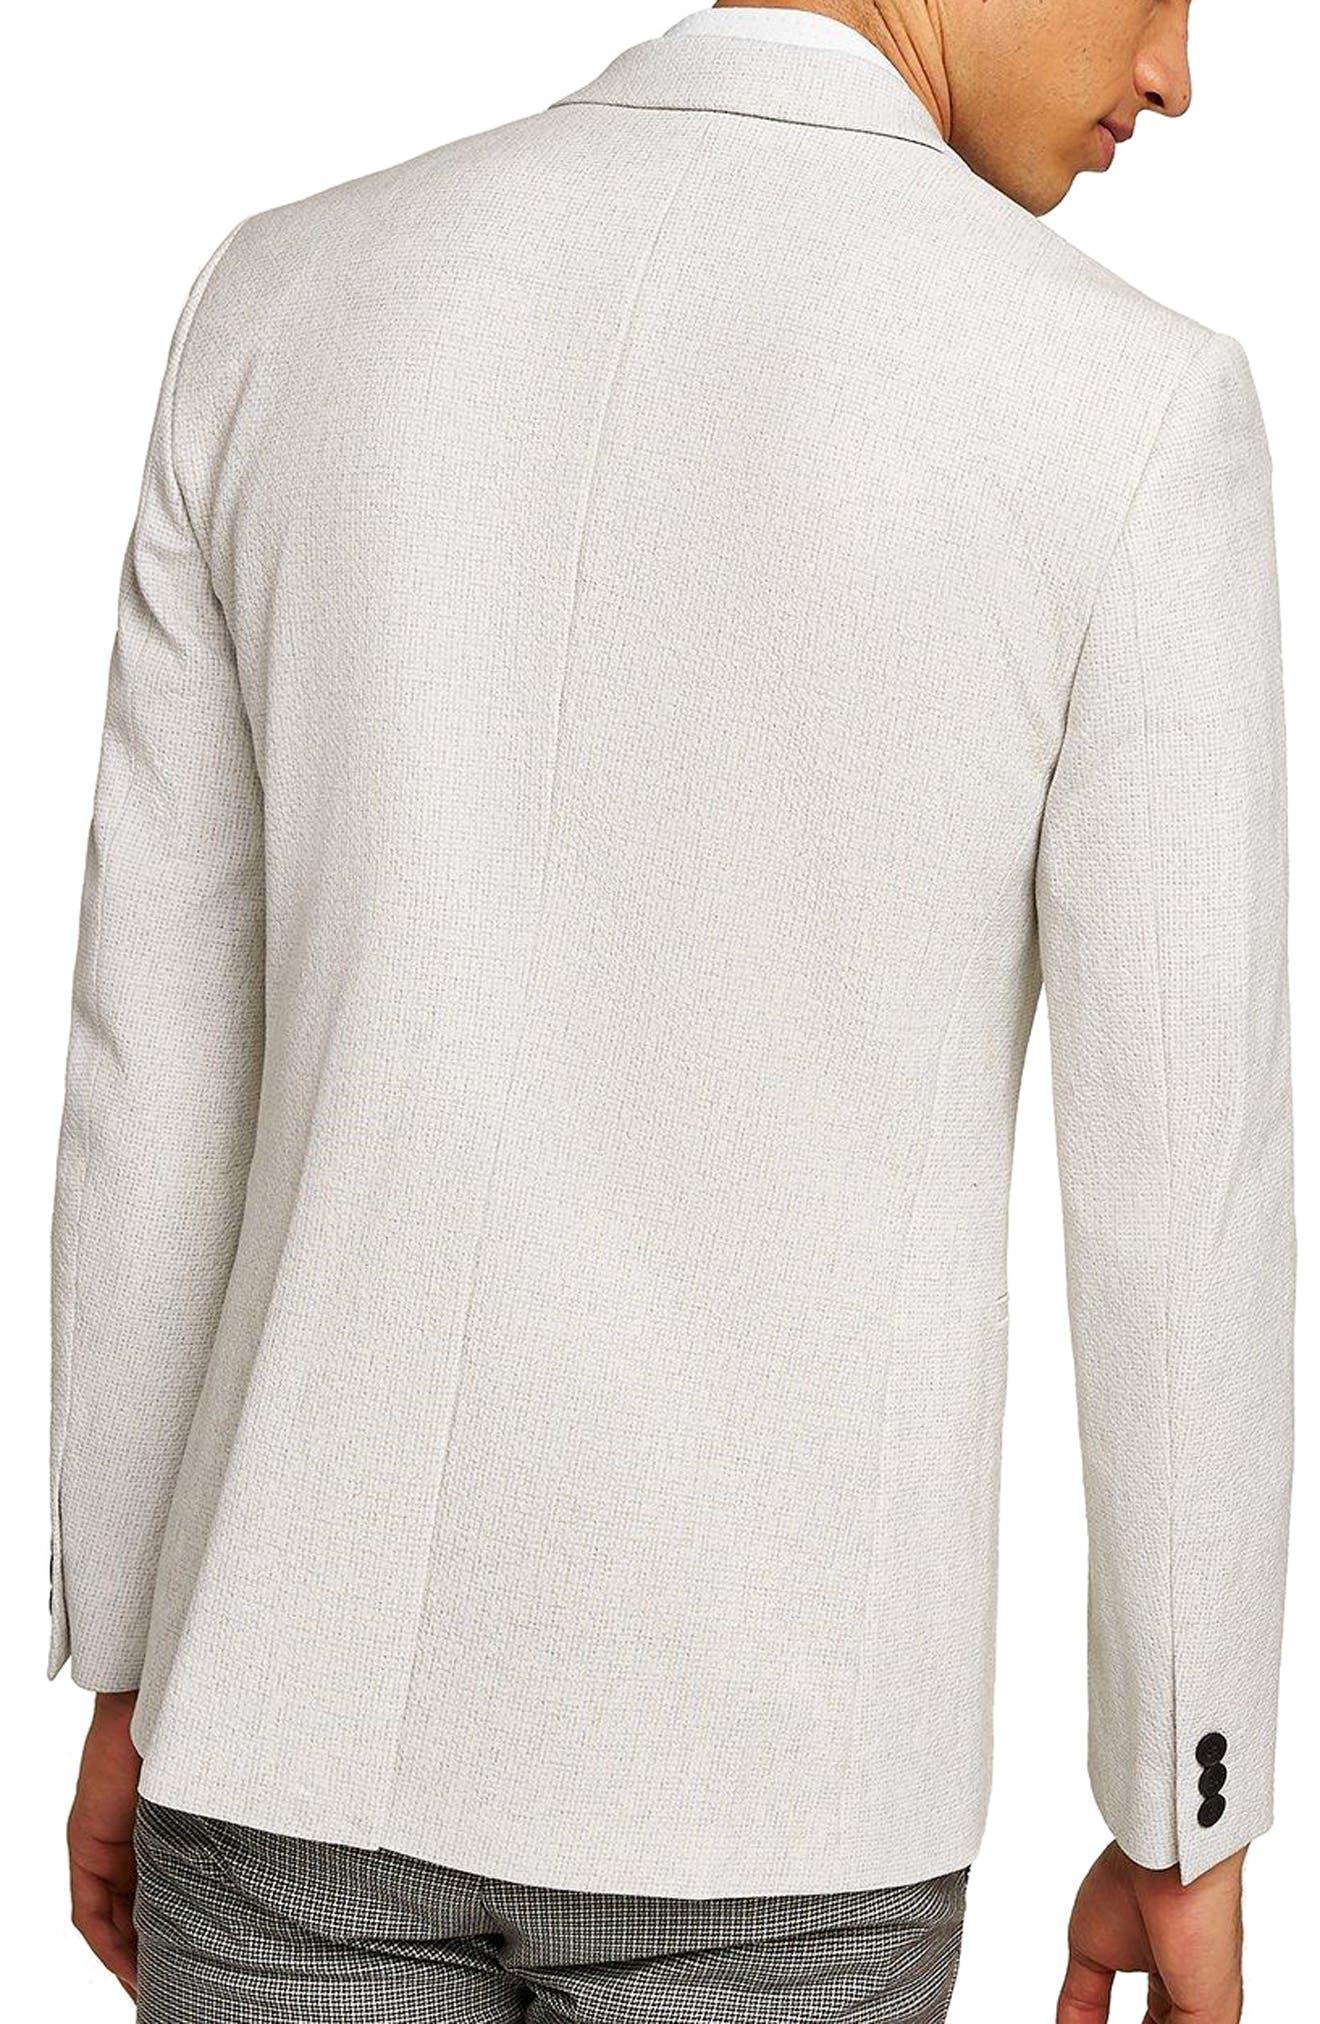 Lionis Skinny Fit Textured Sport Coat,                             Alternate thumbnail 2, color,                             LIGHT GREY